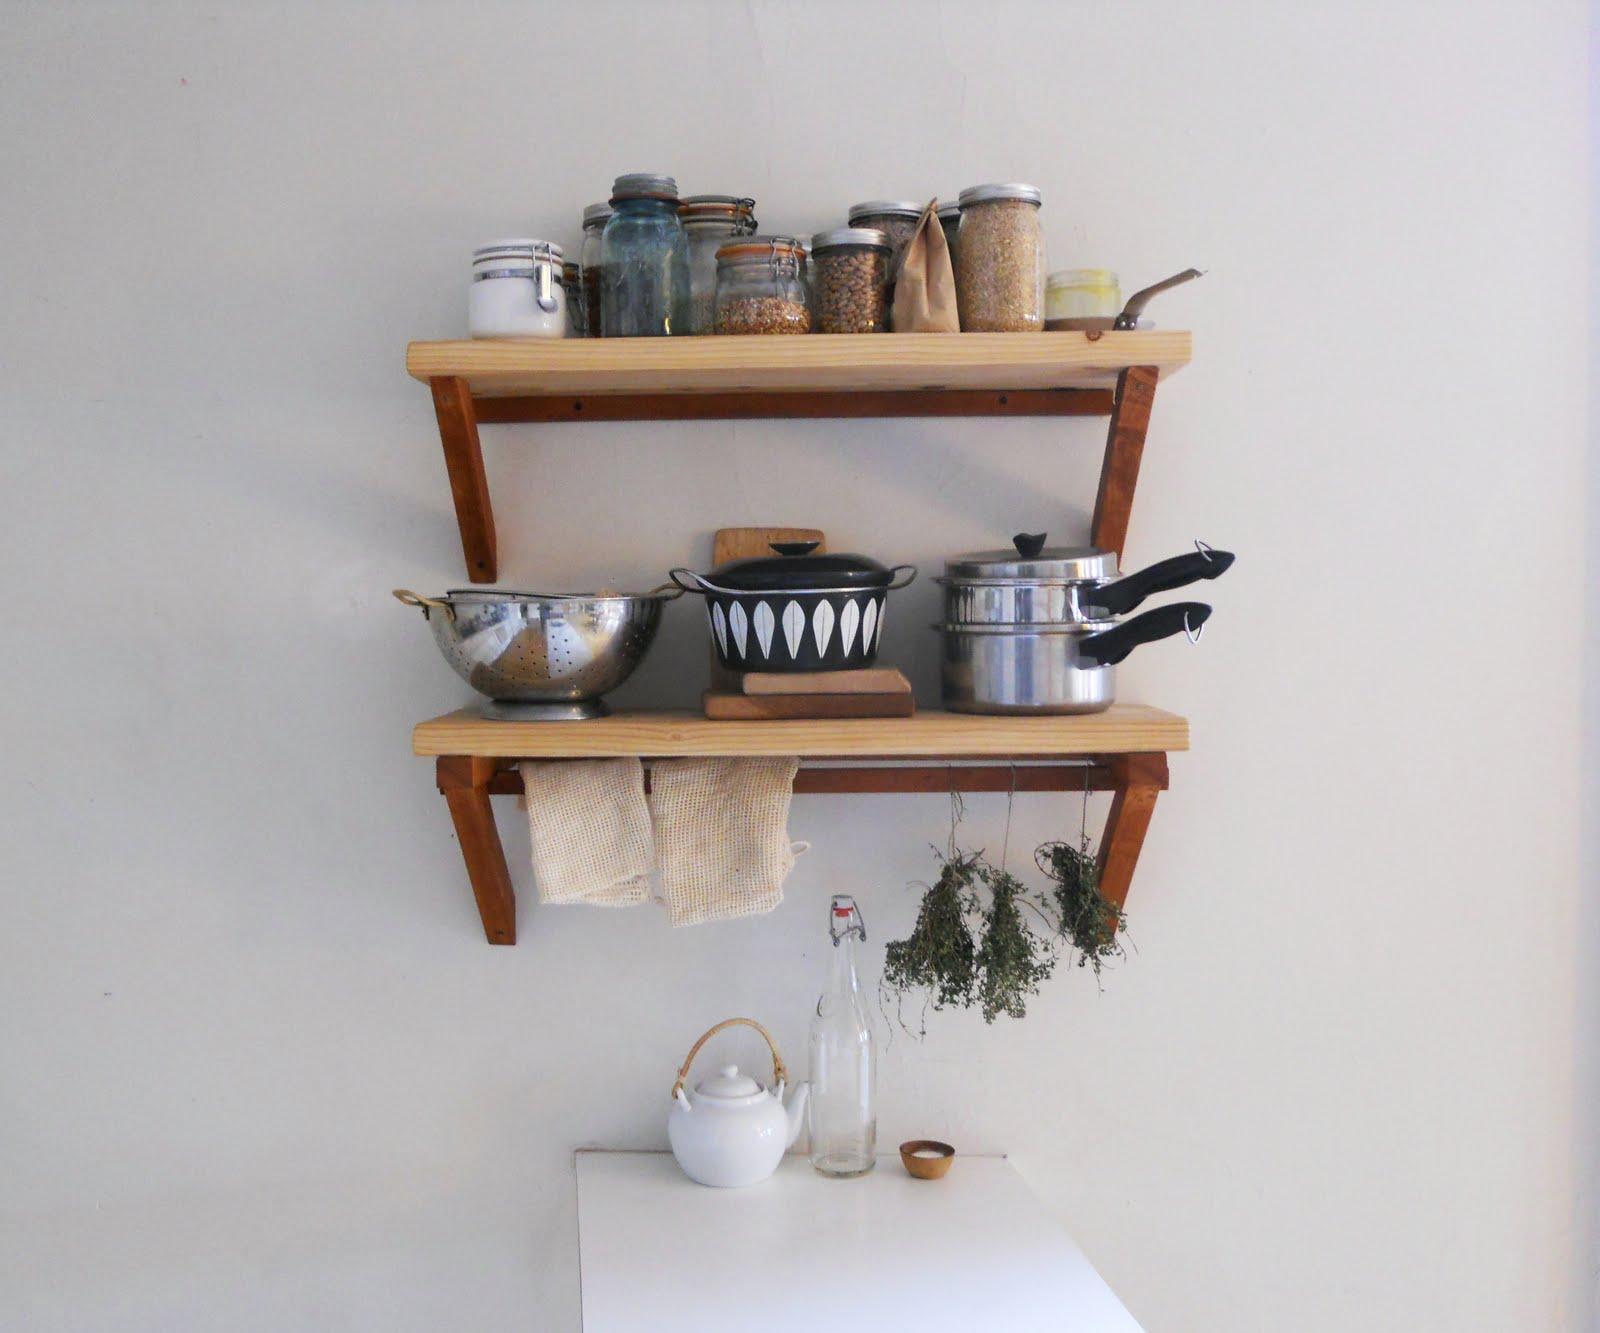 Small kitchen design shelf download wood wall shelves shelf oak